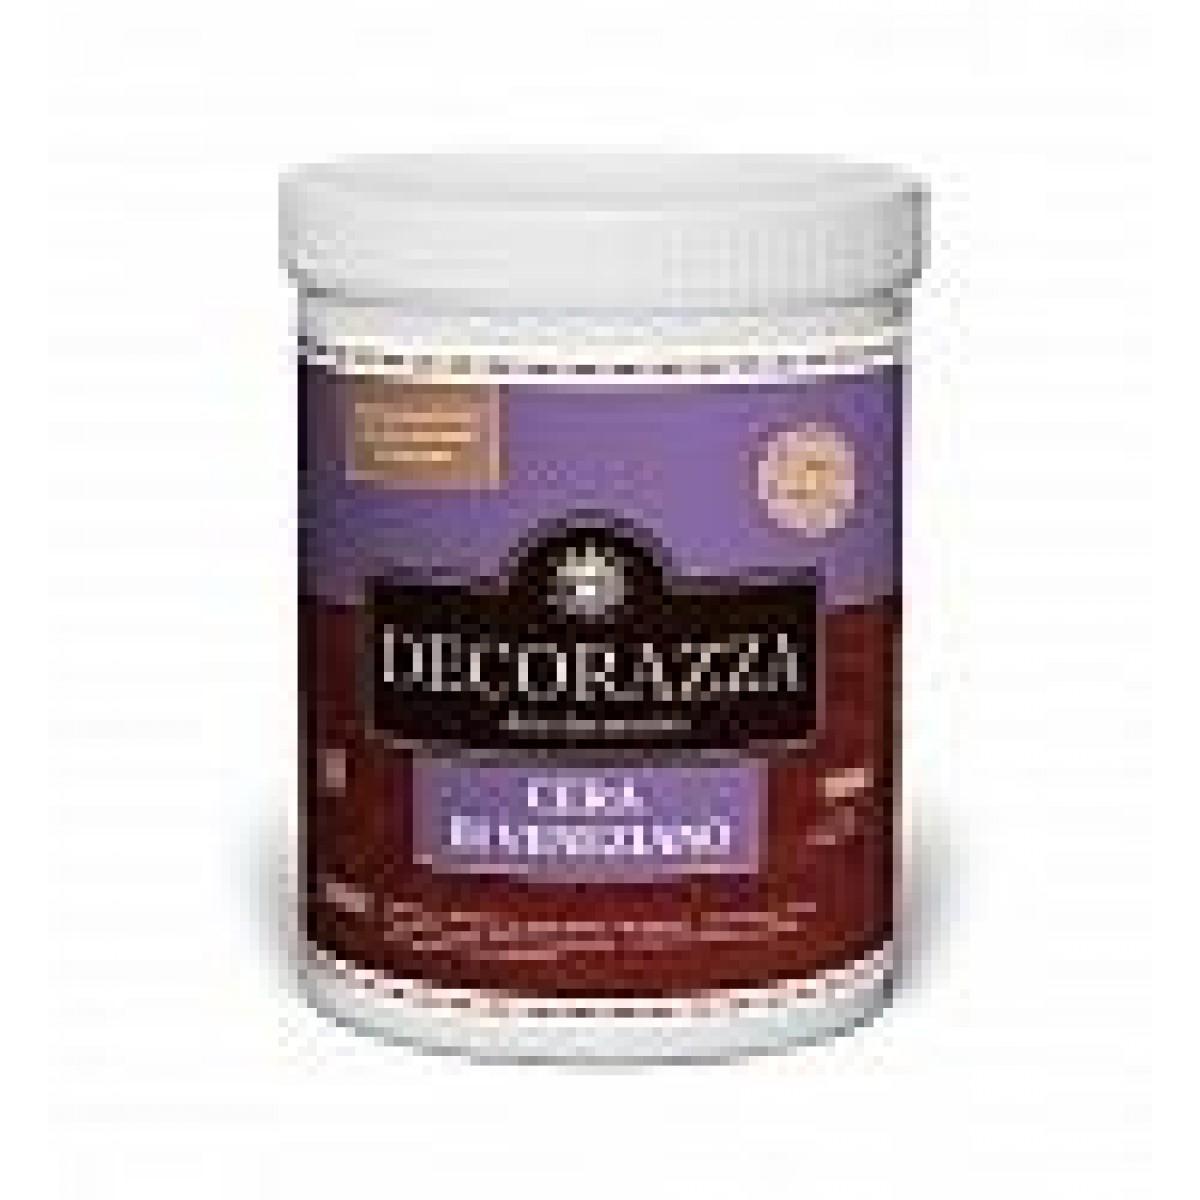 Decorazza Cera di Veneziano - Защитный воск для венецианской штукатурки